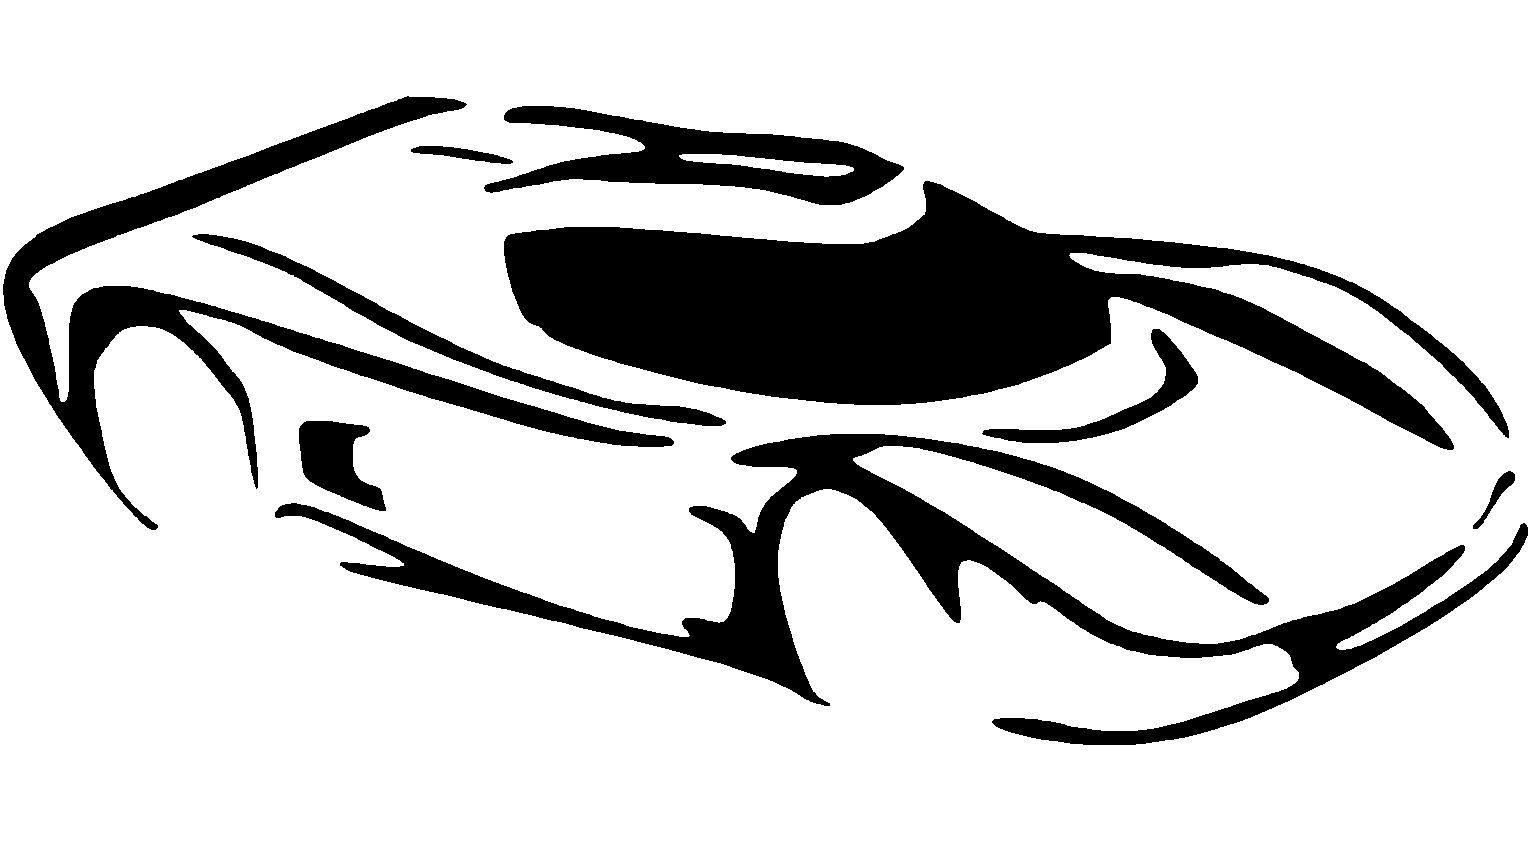 Design An Emblem?-slc-build-manual-cover-jpg